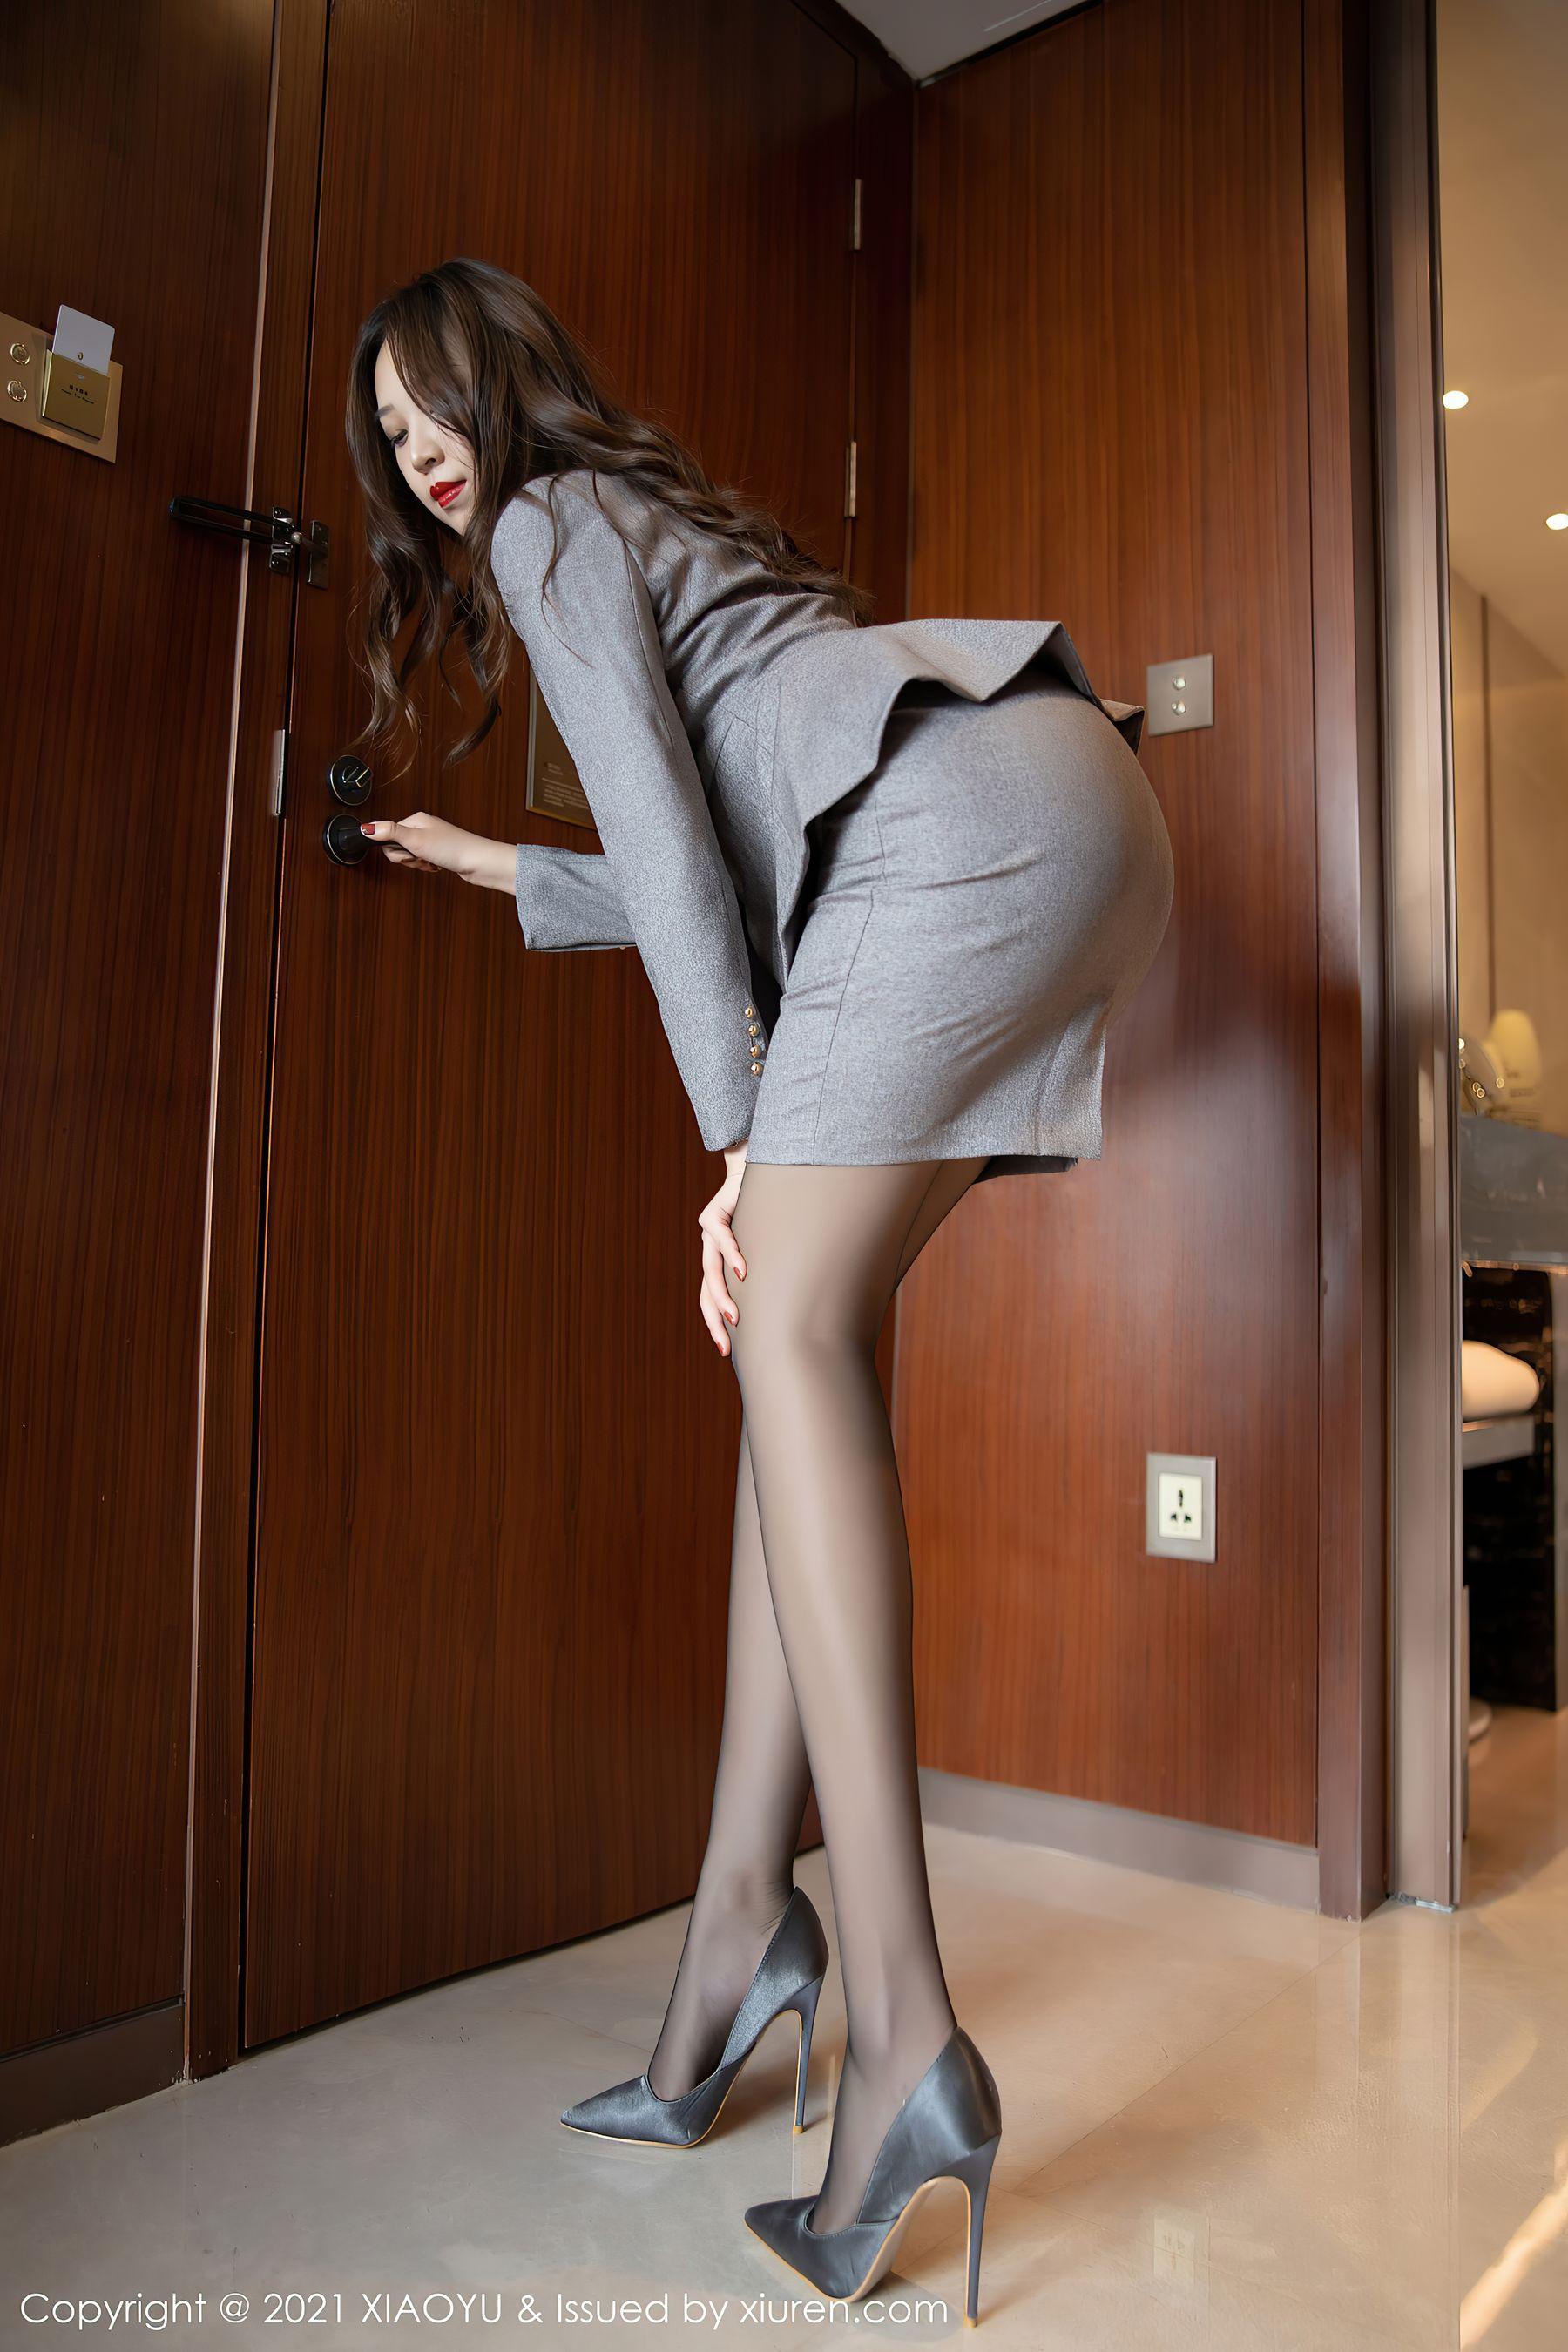 VOL.1560 [语画界]黑丝制服制服诱惑白领丽人:郑颖姗(郑颖姗Bev)超高清写真套图(90P)